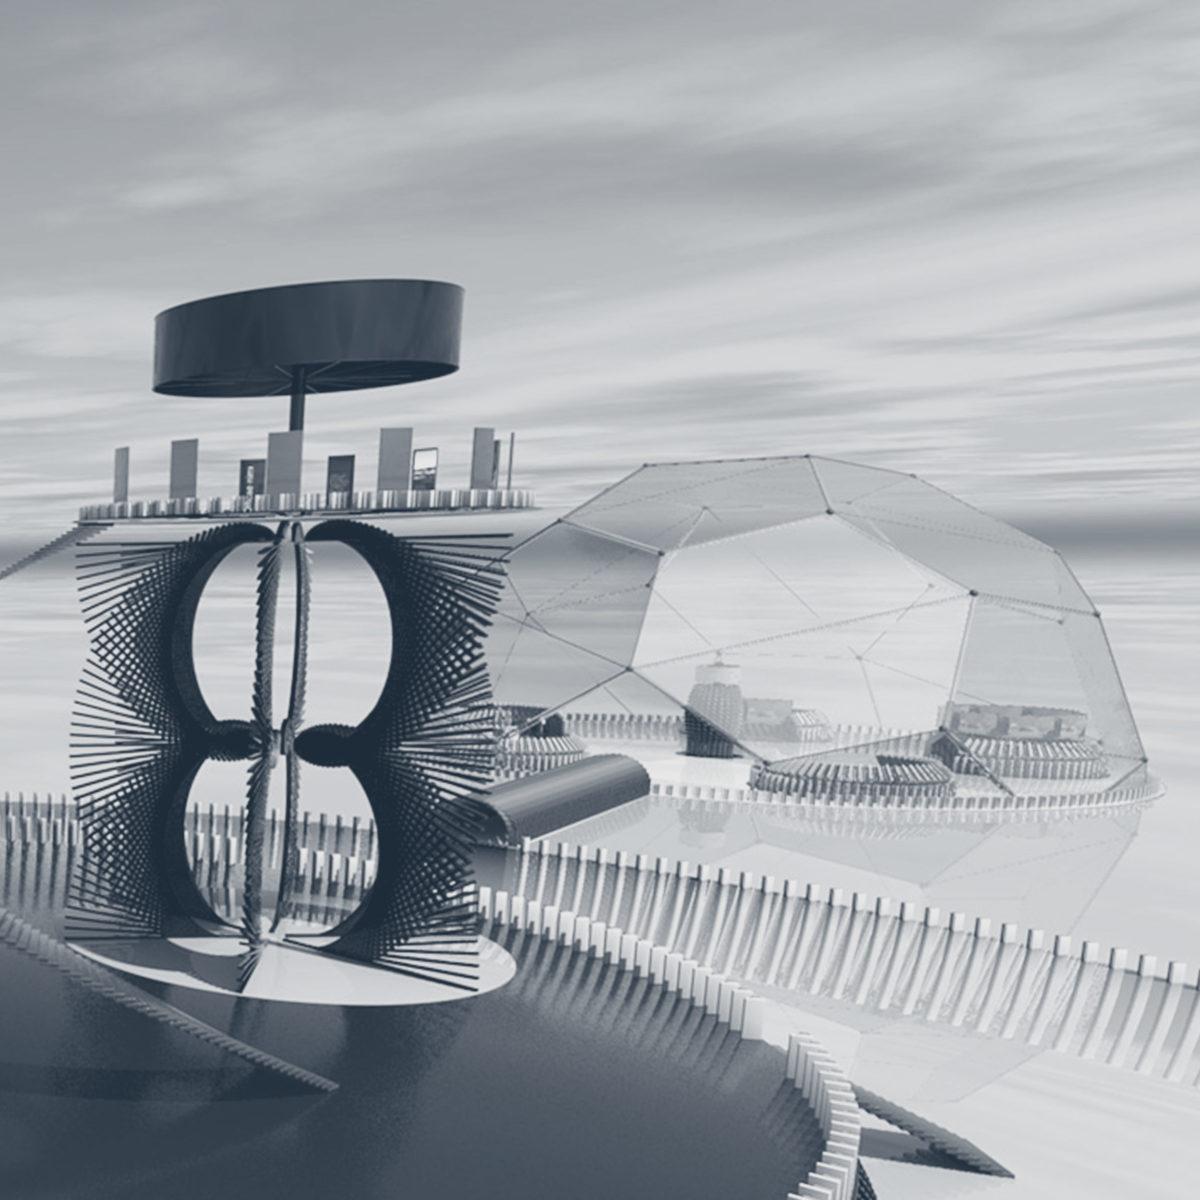 An overview shot of an Enter Agora environment